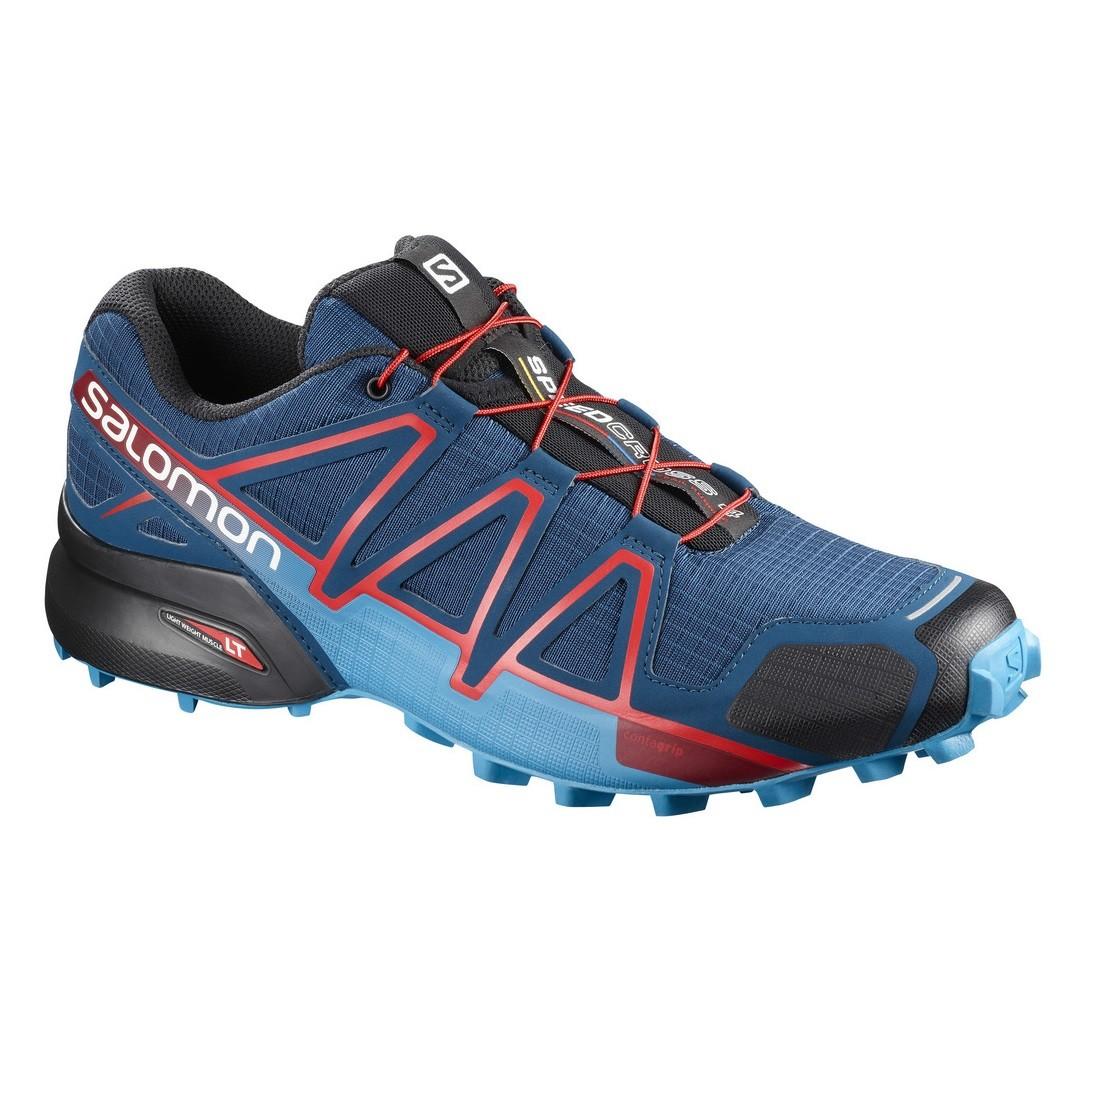 Zapatillas Salomon SpeedCross 4 L40079700 Deportes Manzanedo